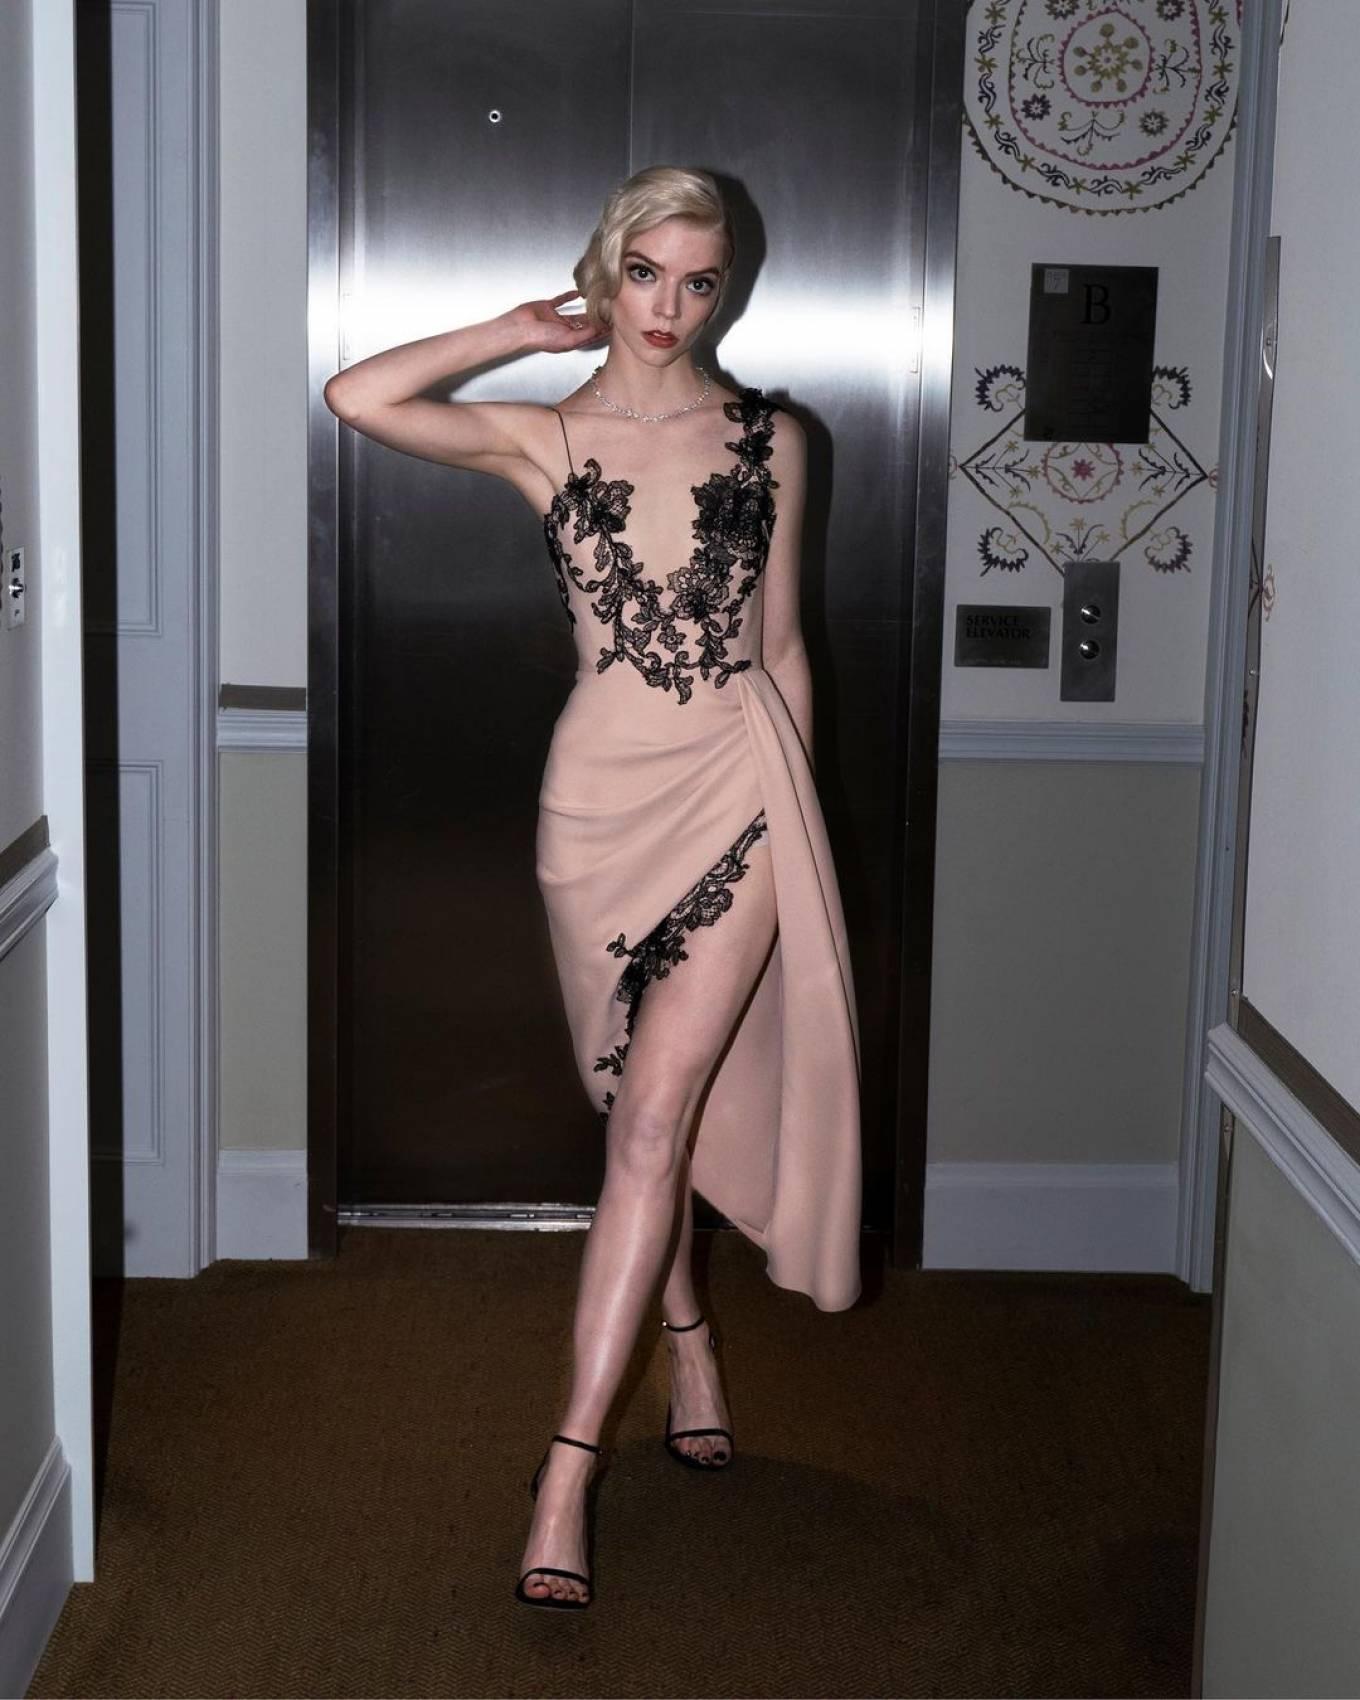 Anya Taylor-Joy - 2021 Screen Actors Guild Awards Photoshoot